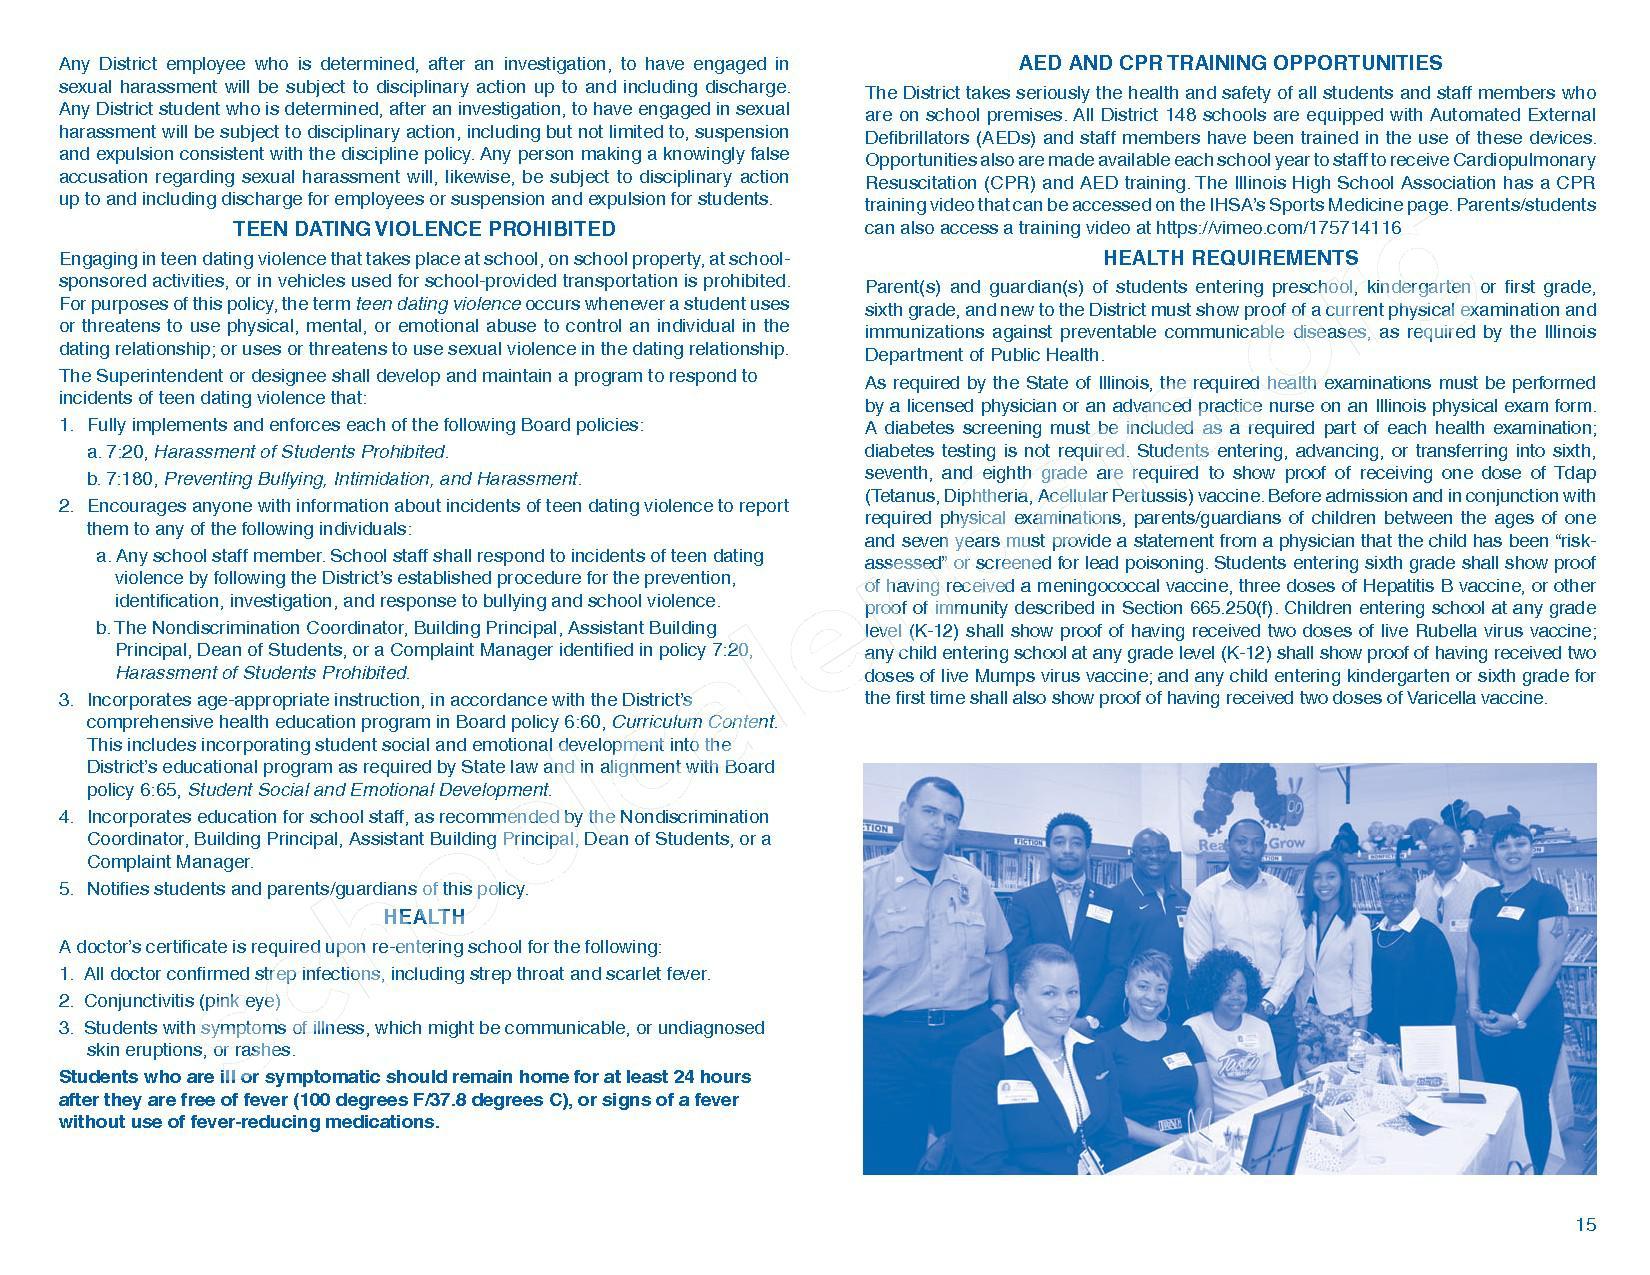 2016 - 2017 Parent/Student Handbook – Roosevelt Elementary School – page 19